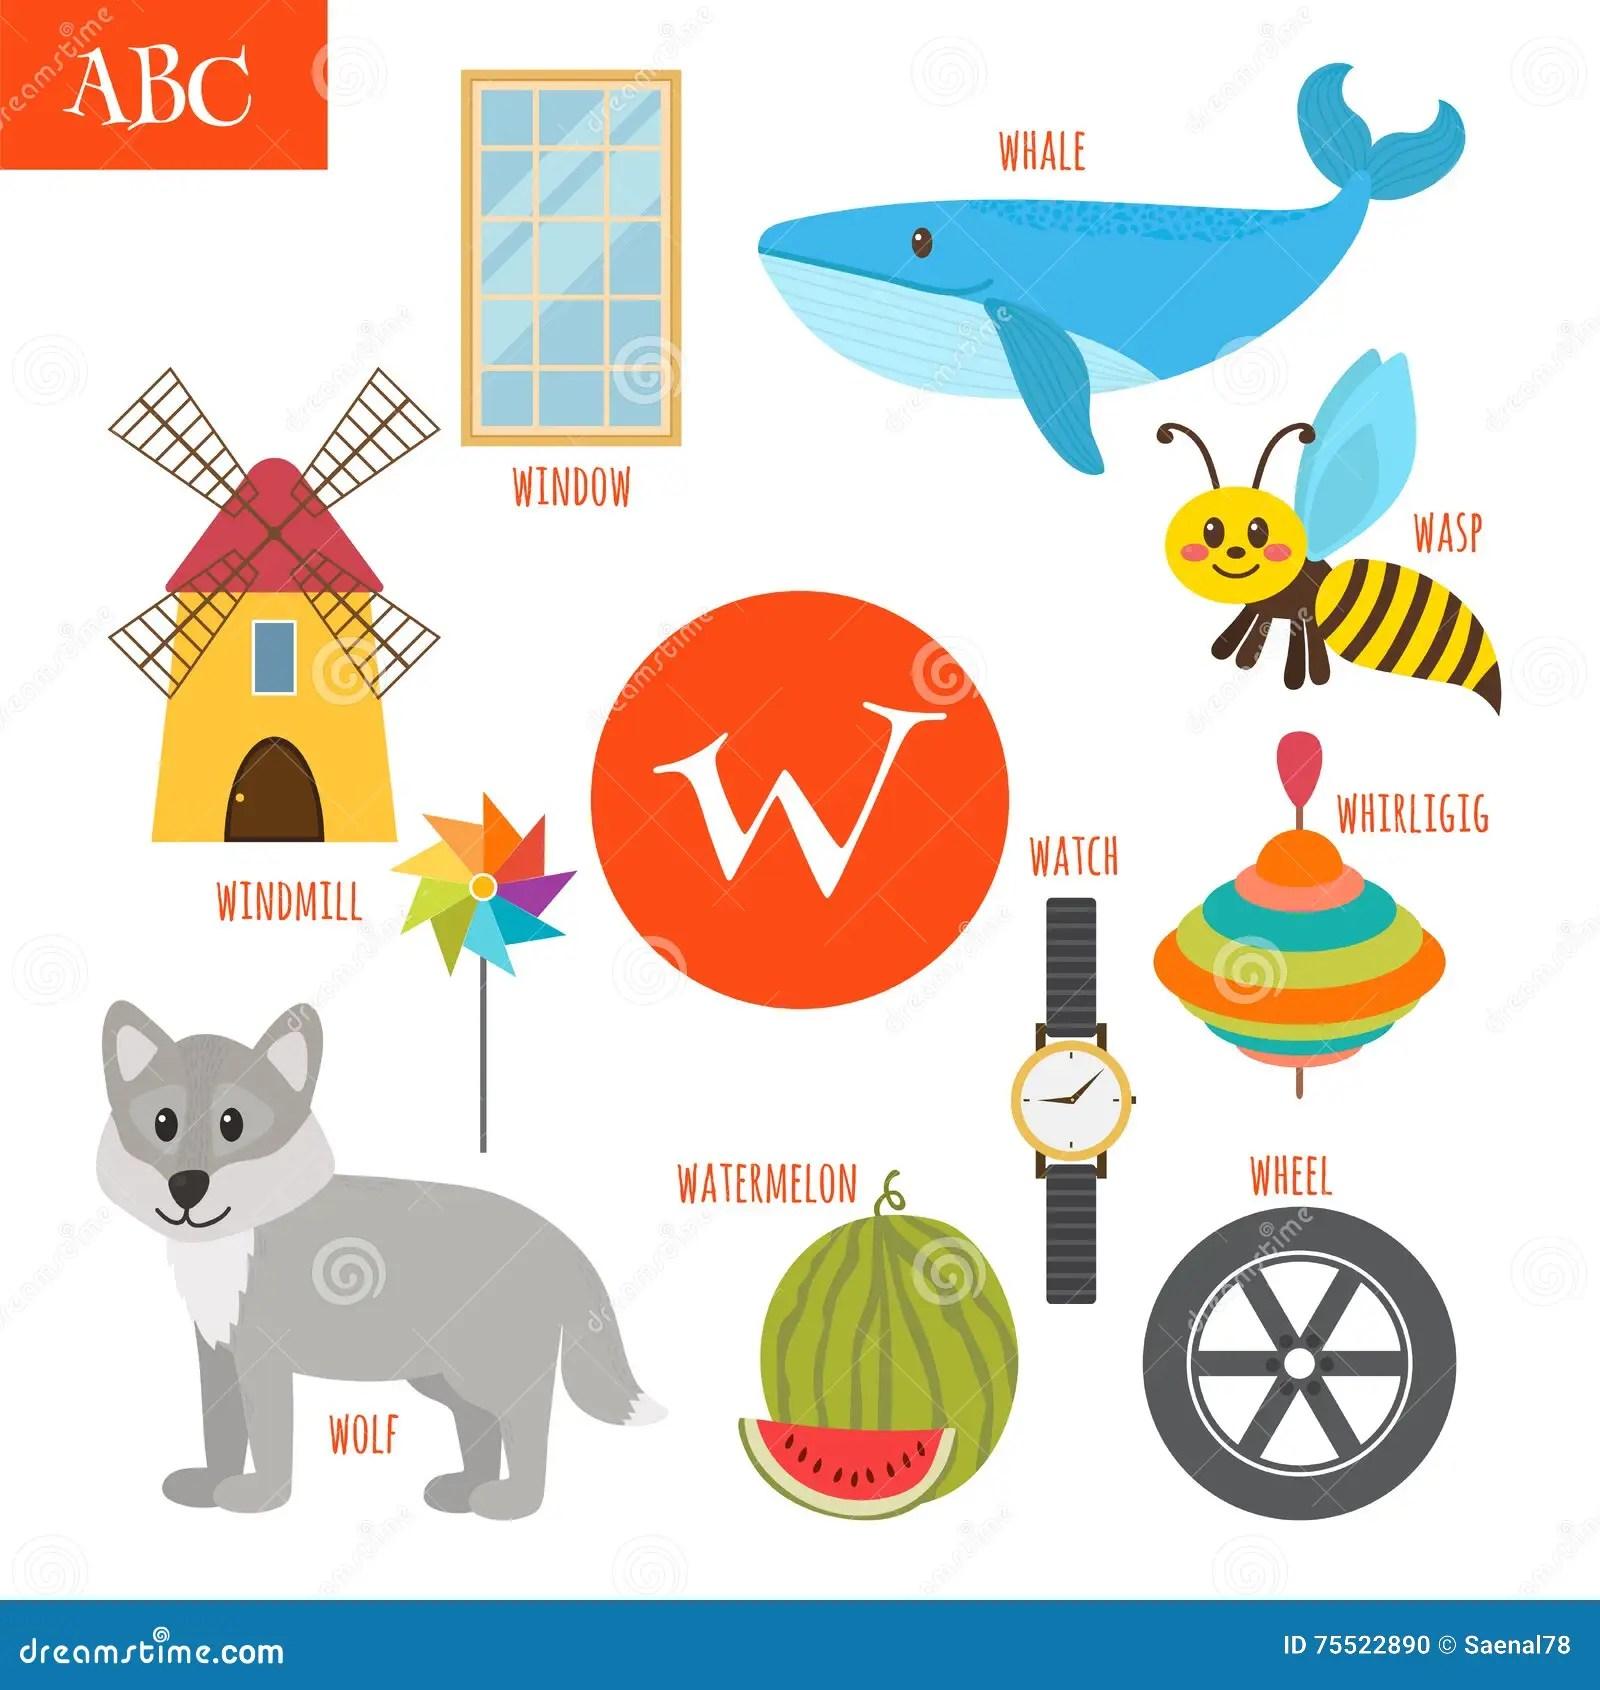 Letter W Cartoon Alphabet For Children Watermelon Whale Wolf Stock Vector